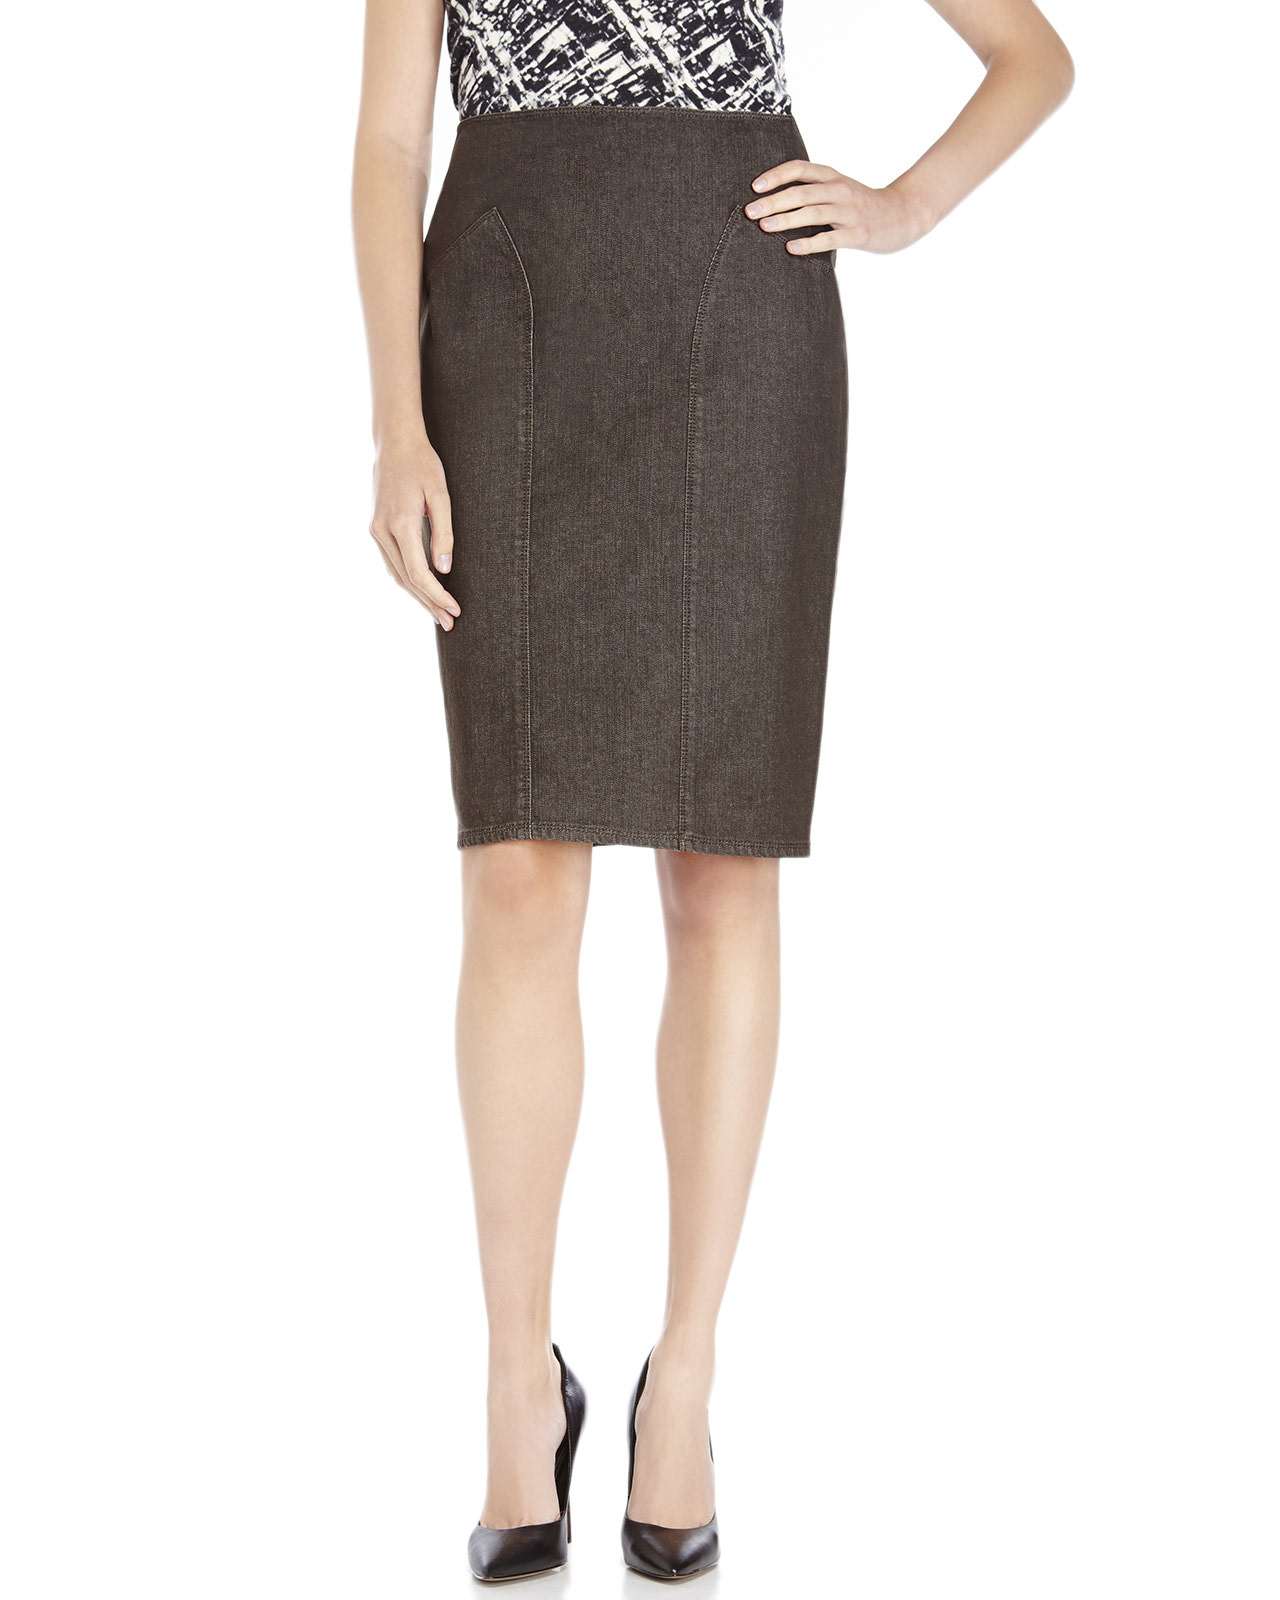 Lafayette 148 new york Brown Denim Skirt in Brown | Lyst